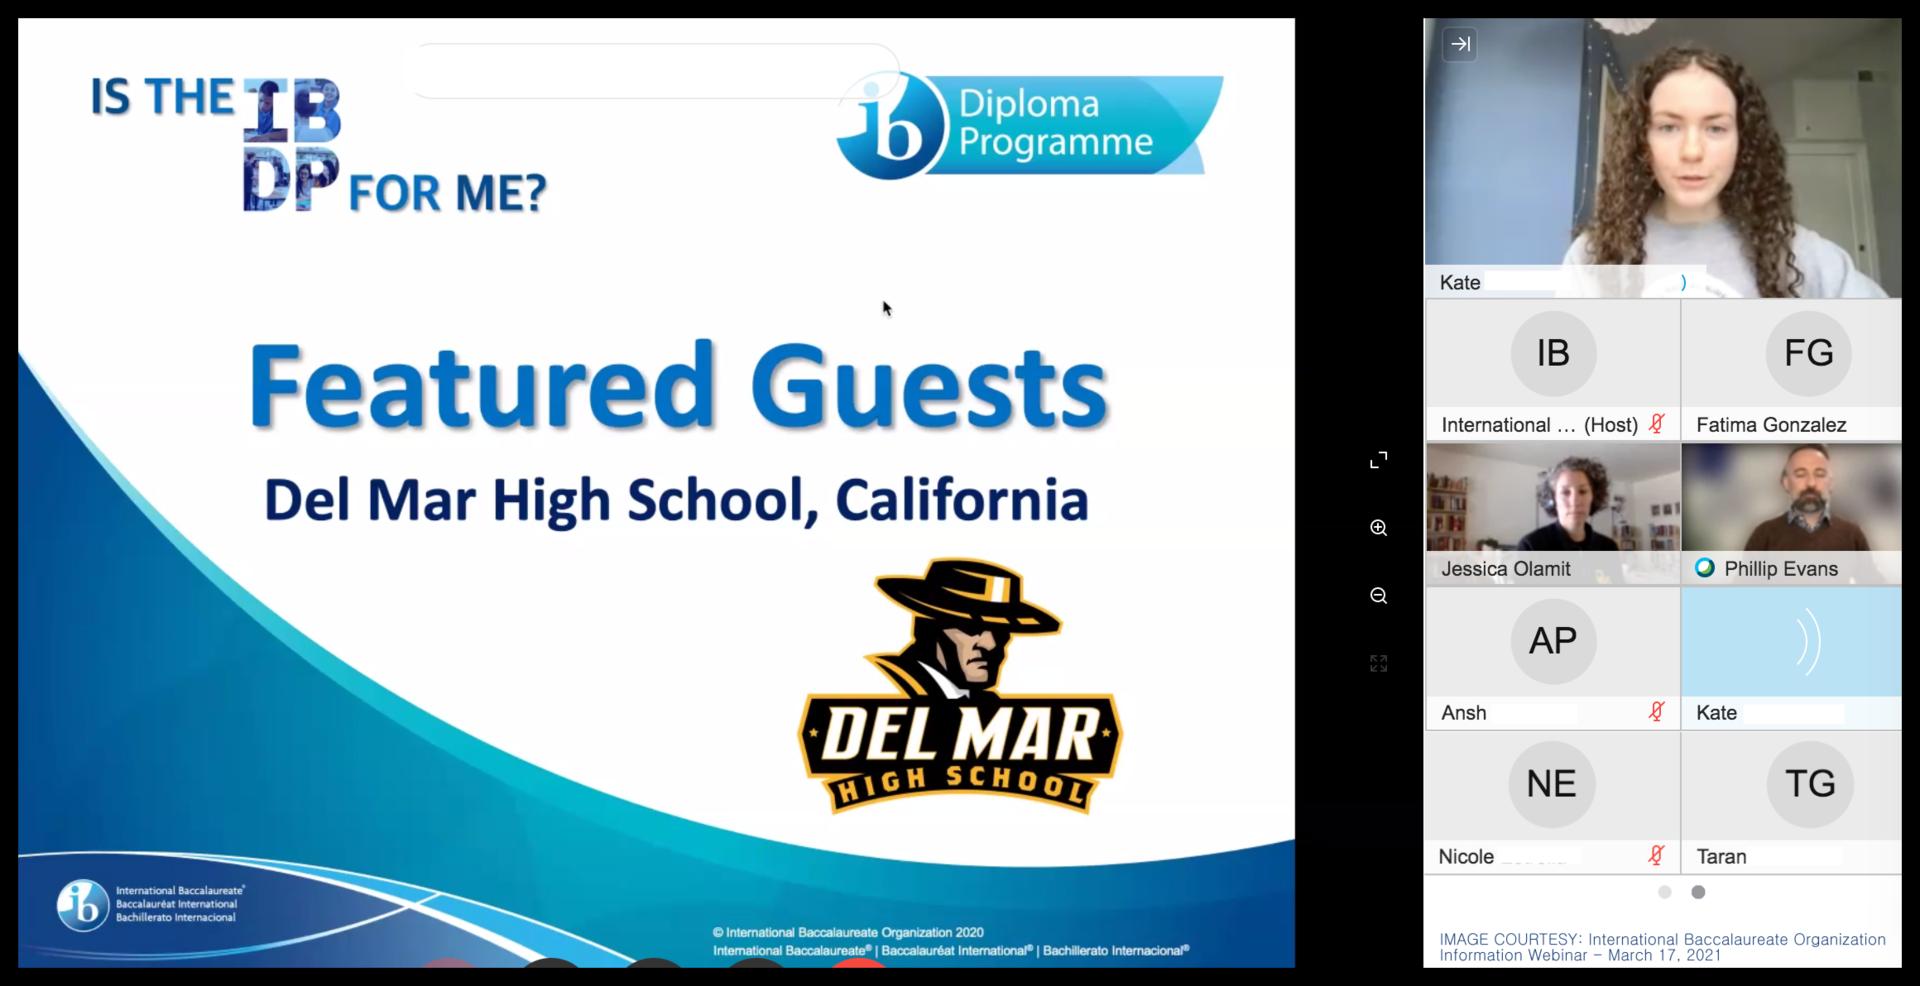 del mar students featured in ib international webinar on march 17 2021